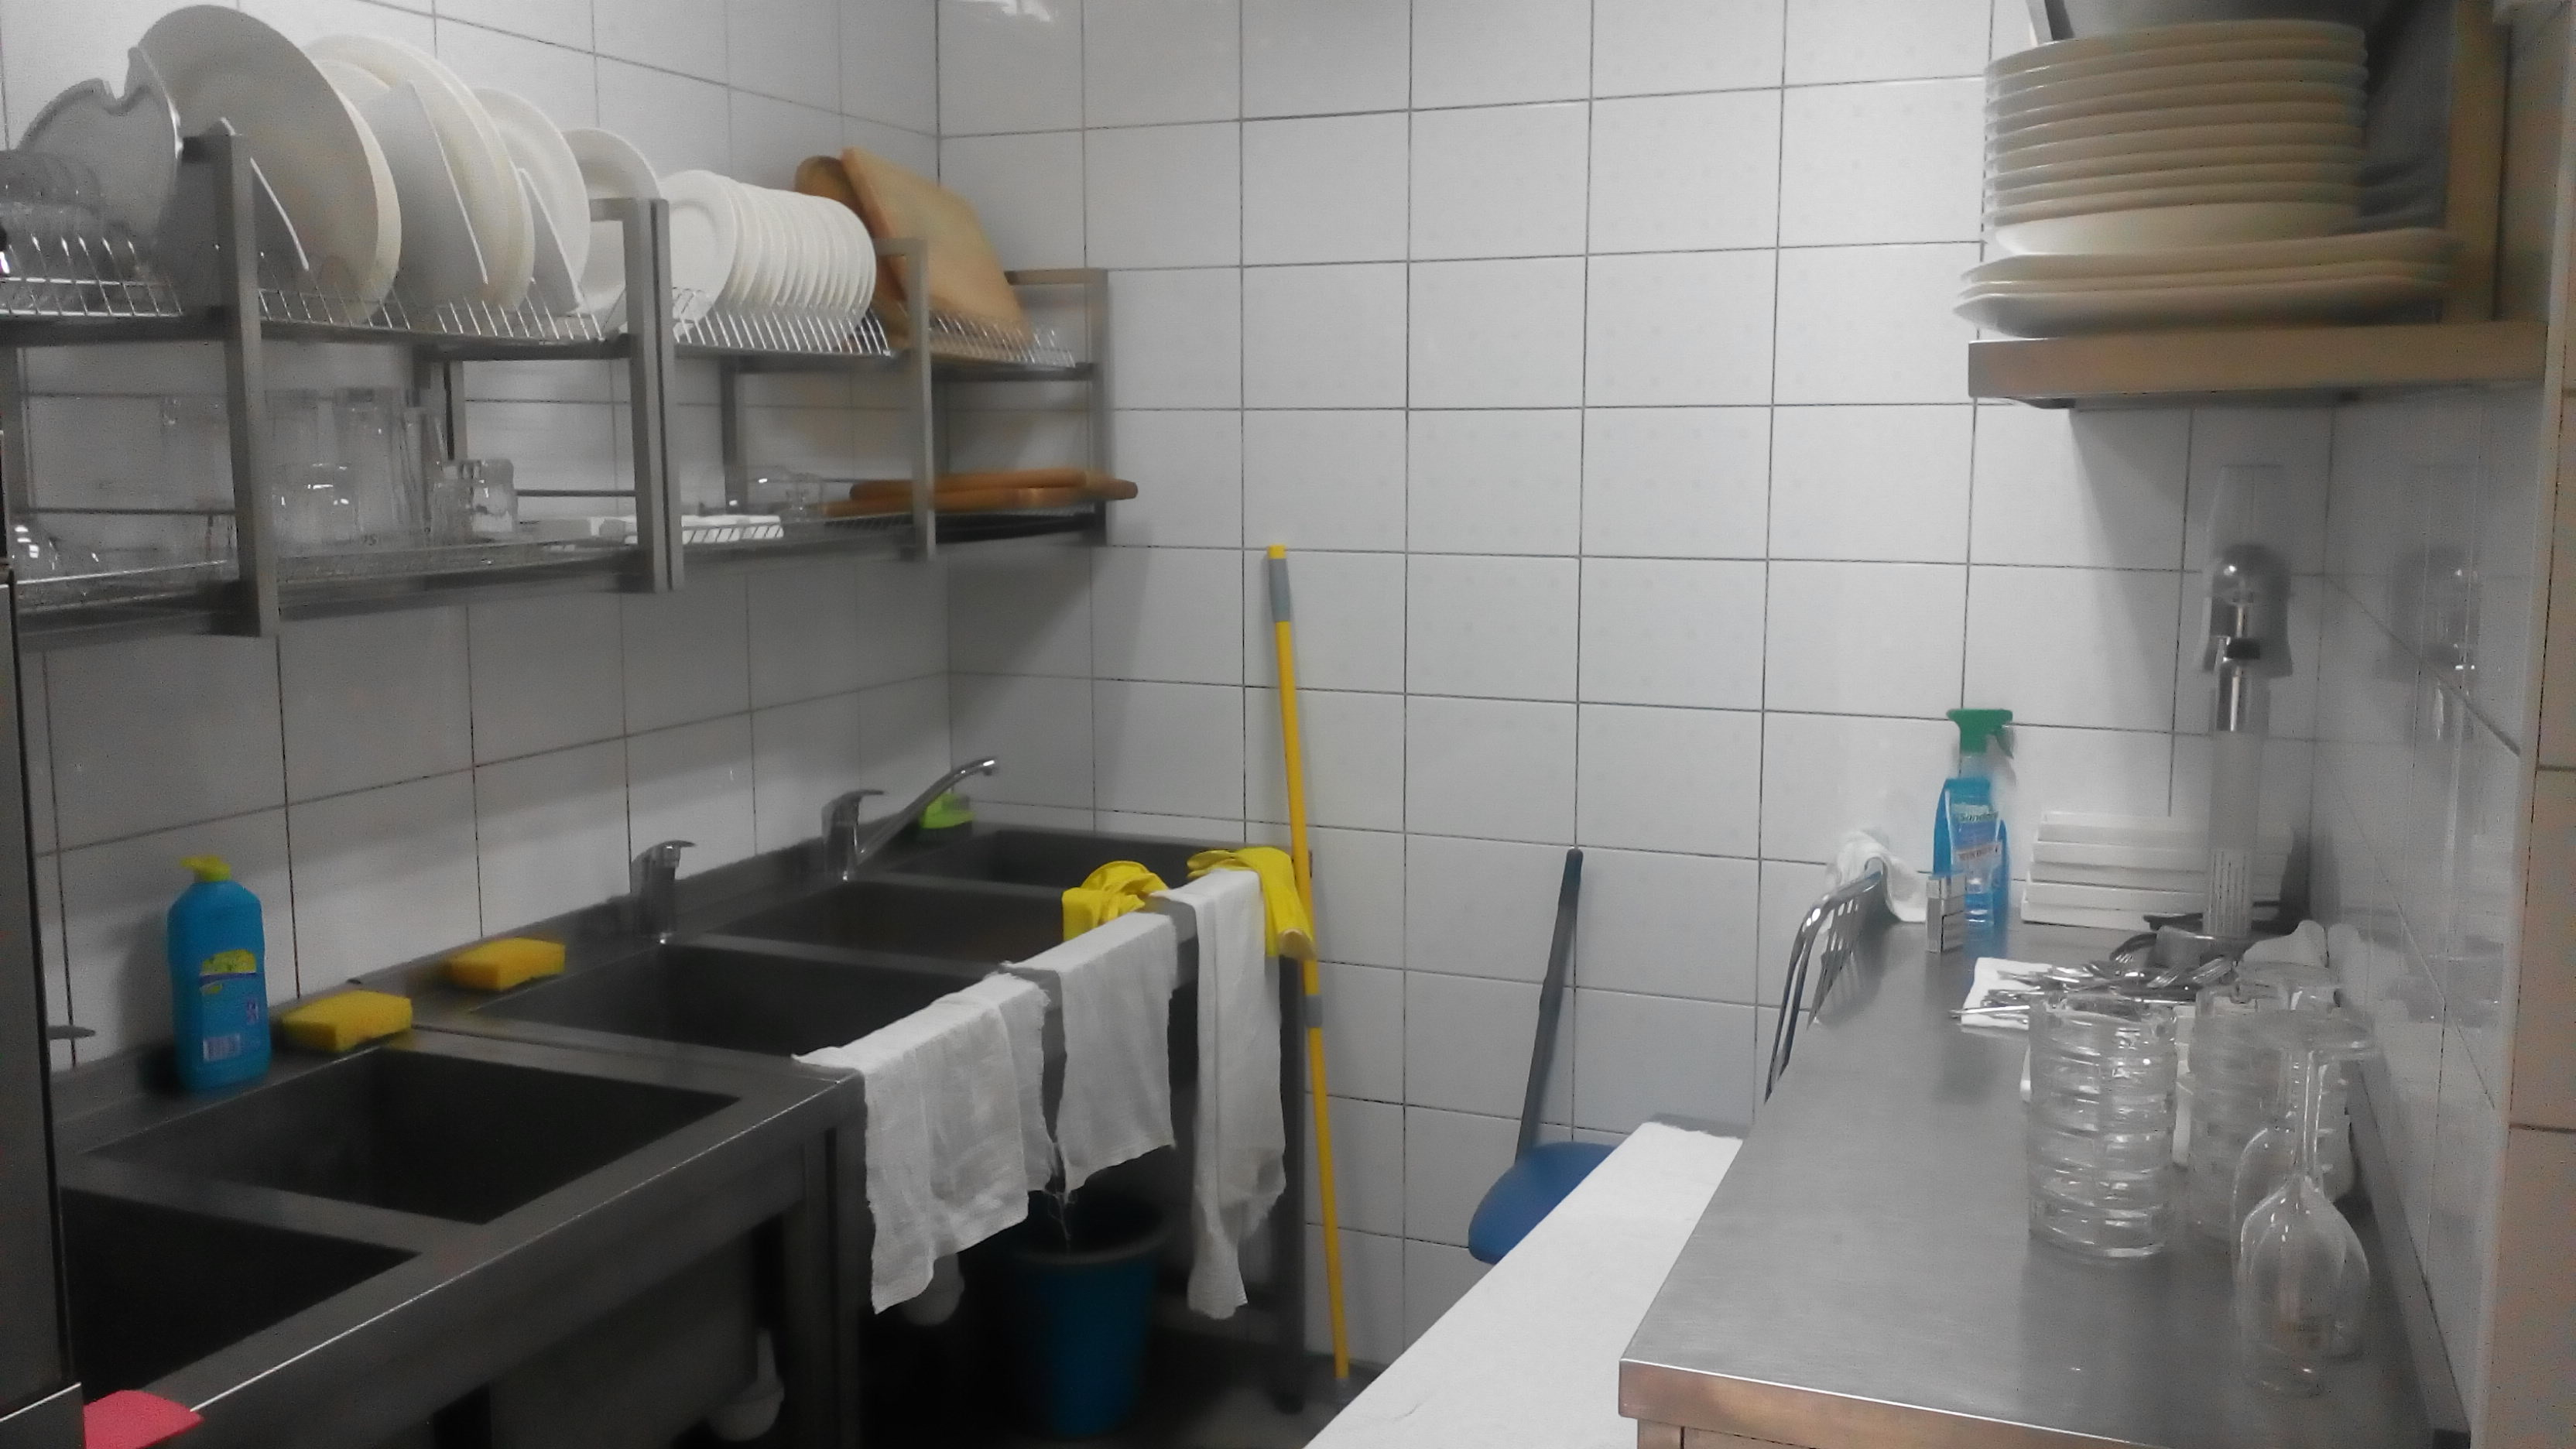 Фото Мойка посуды в ресторане. Фото после. Час времени.